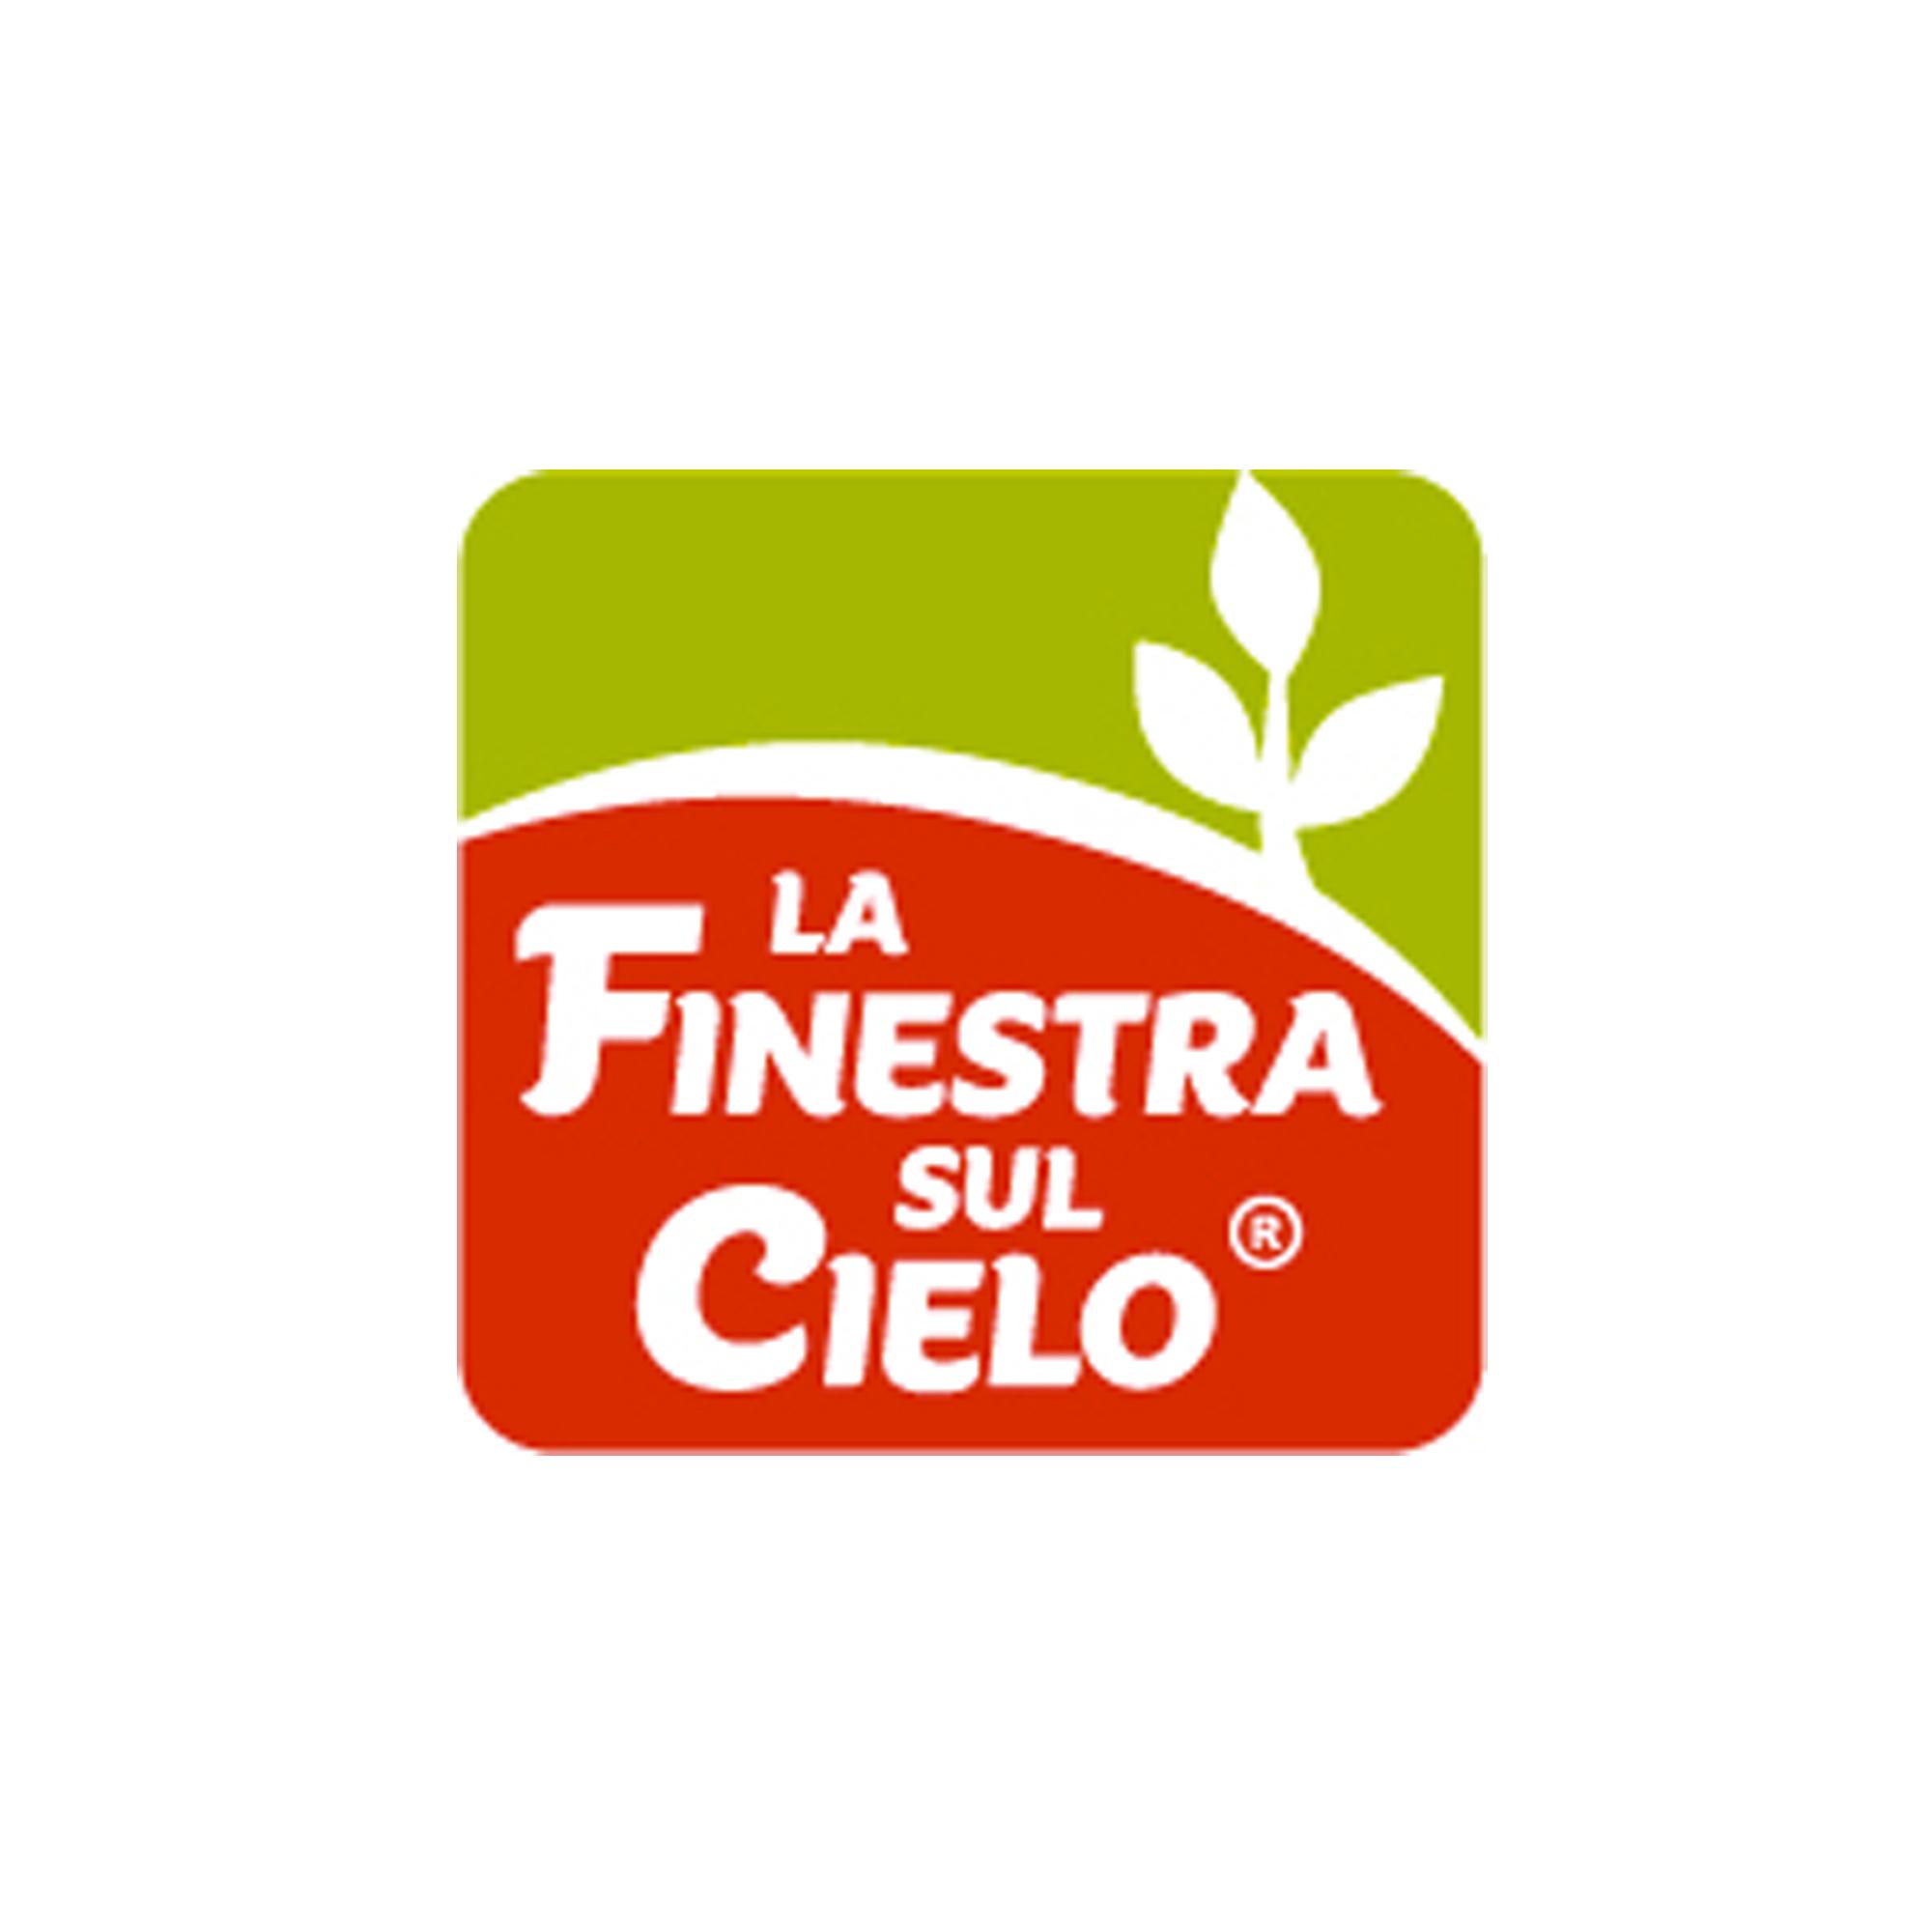 Finestra logga square.jpg